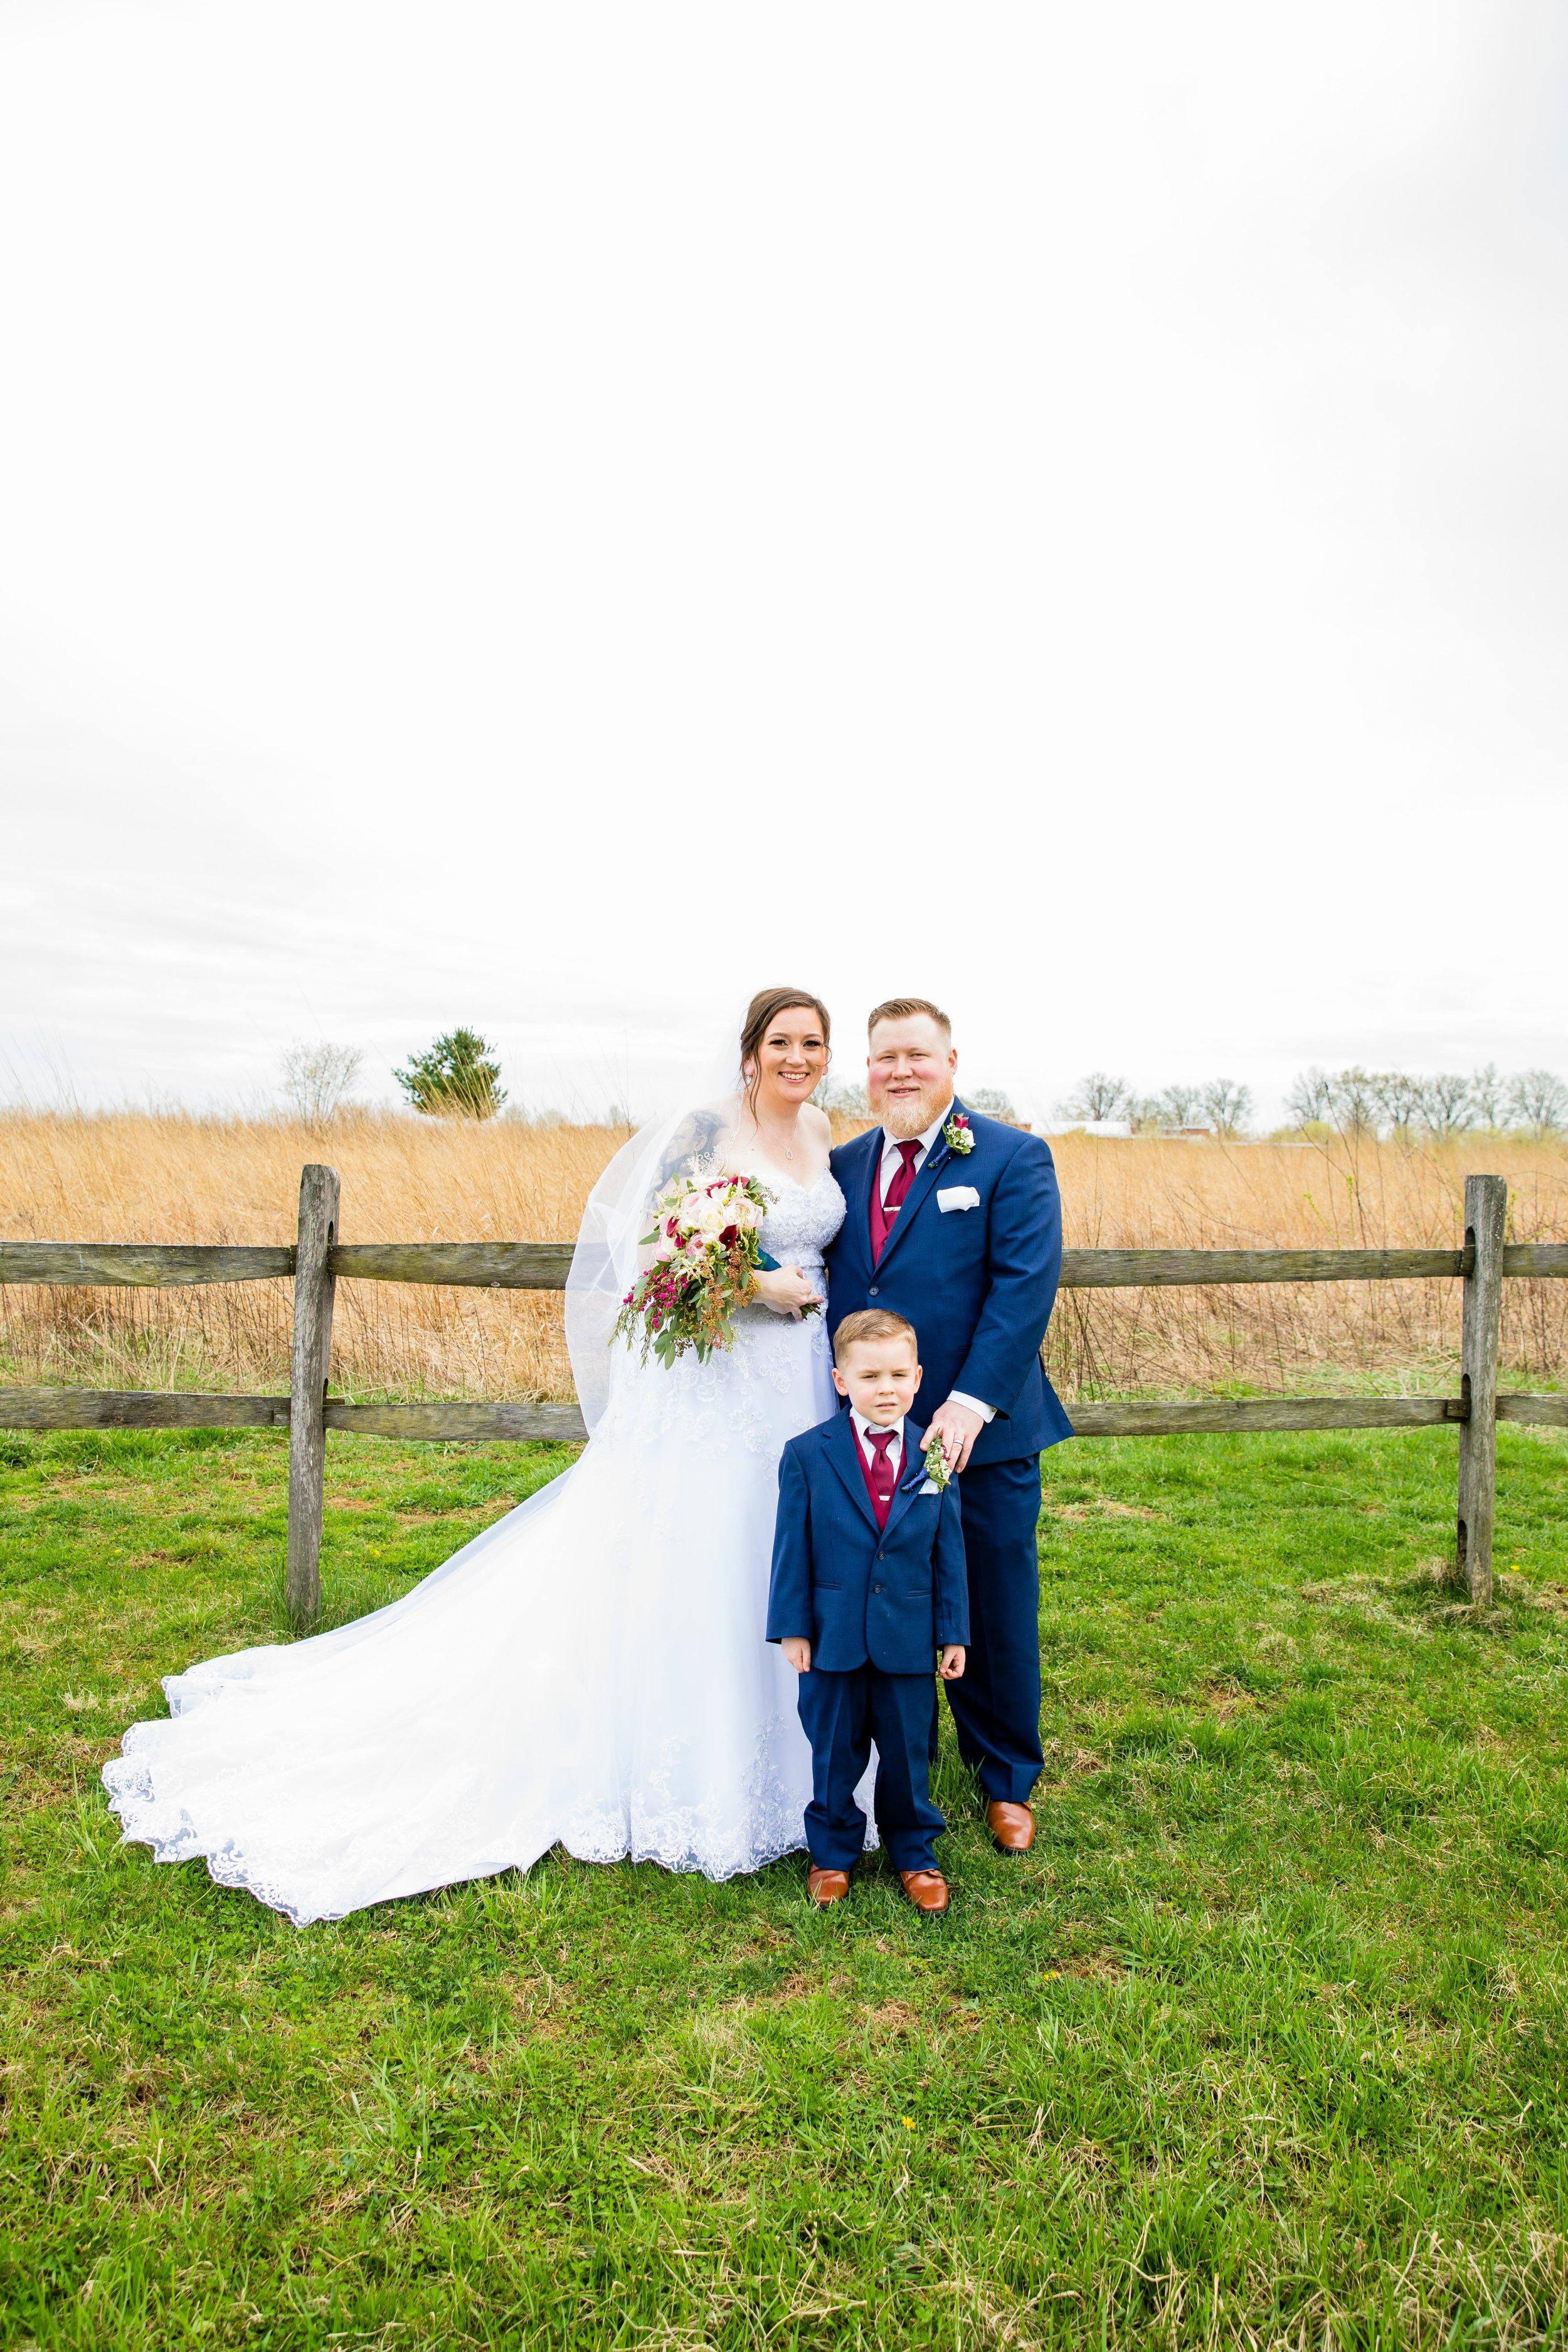 KRISTINA AND SHAWN - WATERFALL ROOM WEDDING - PHILADELPHIA-81.jpg